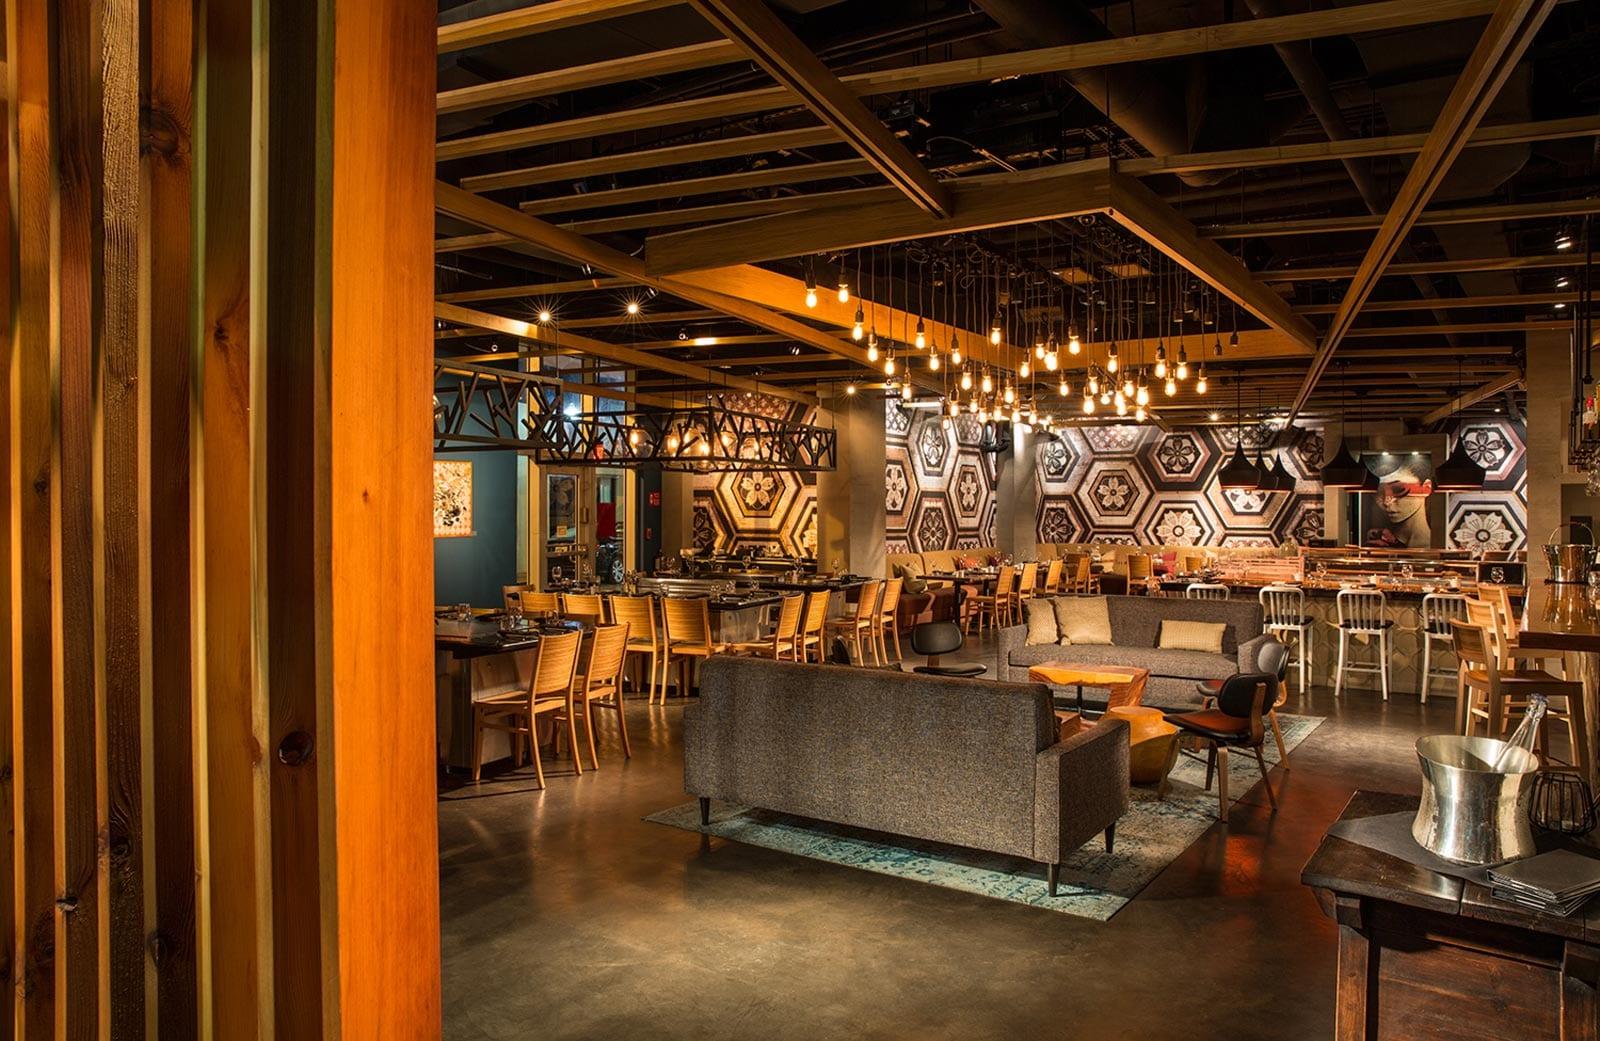 soowoo - nightclub design, bar & restaurant designbig time